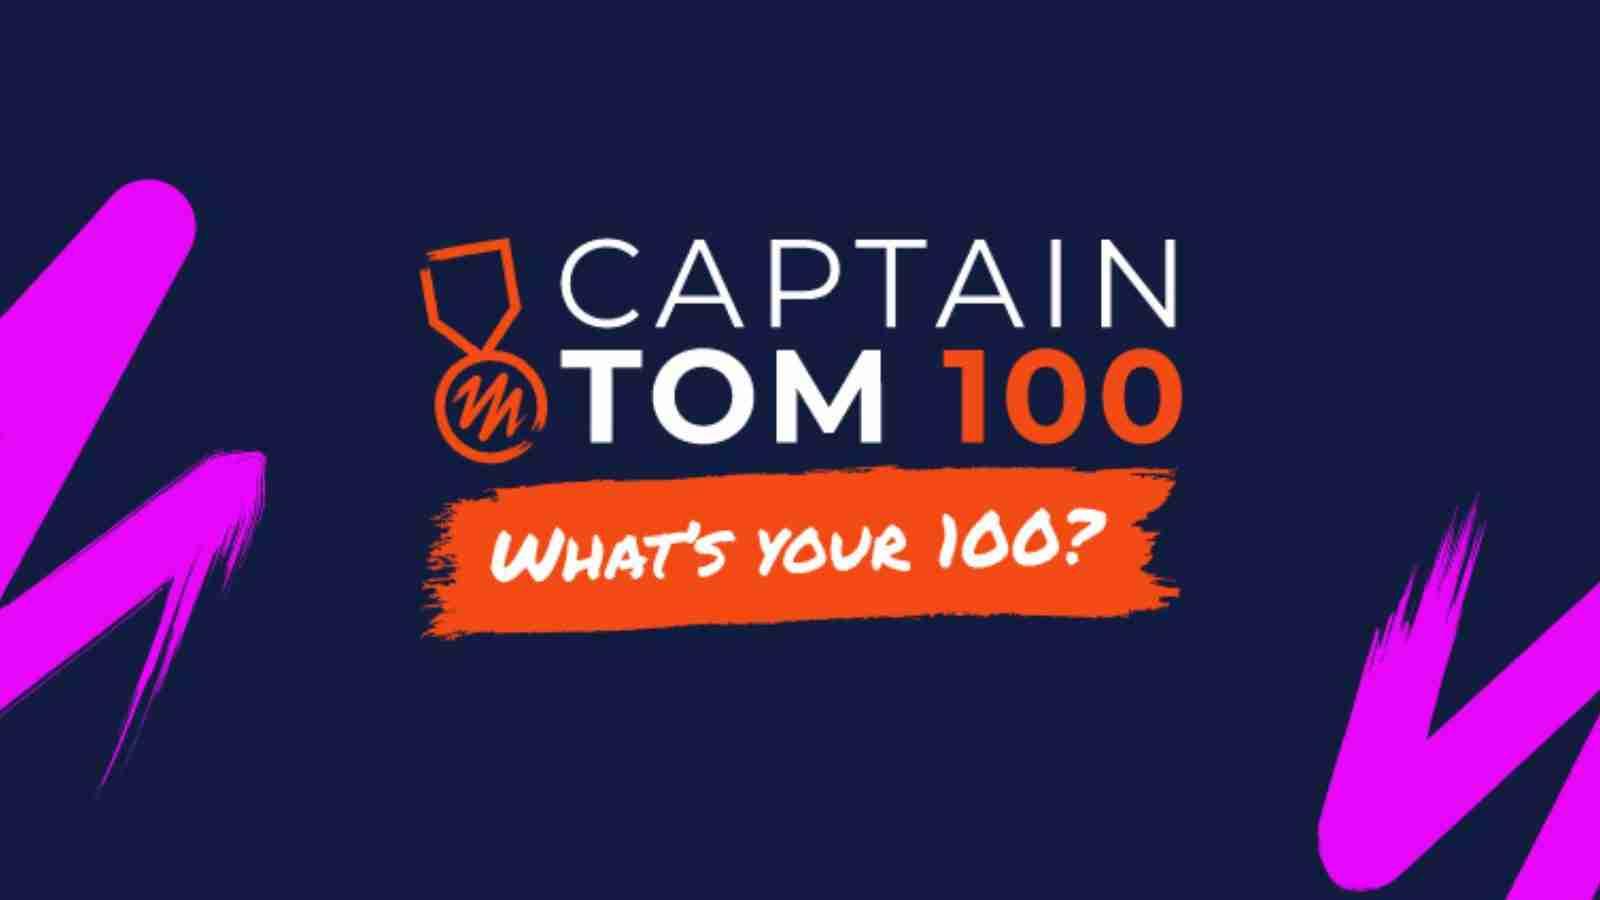 Take on the Captain Tom 100 Challenge for PASIC